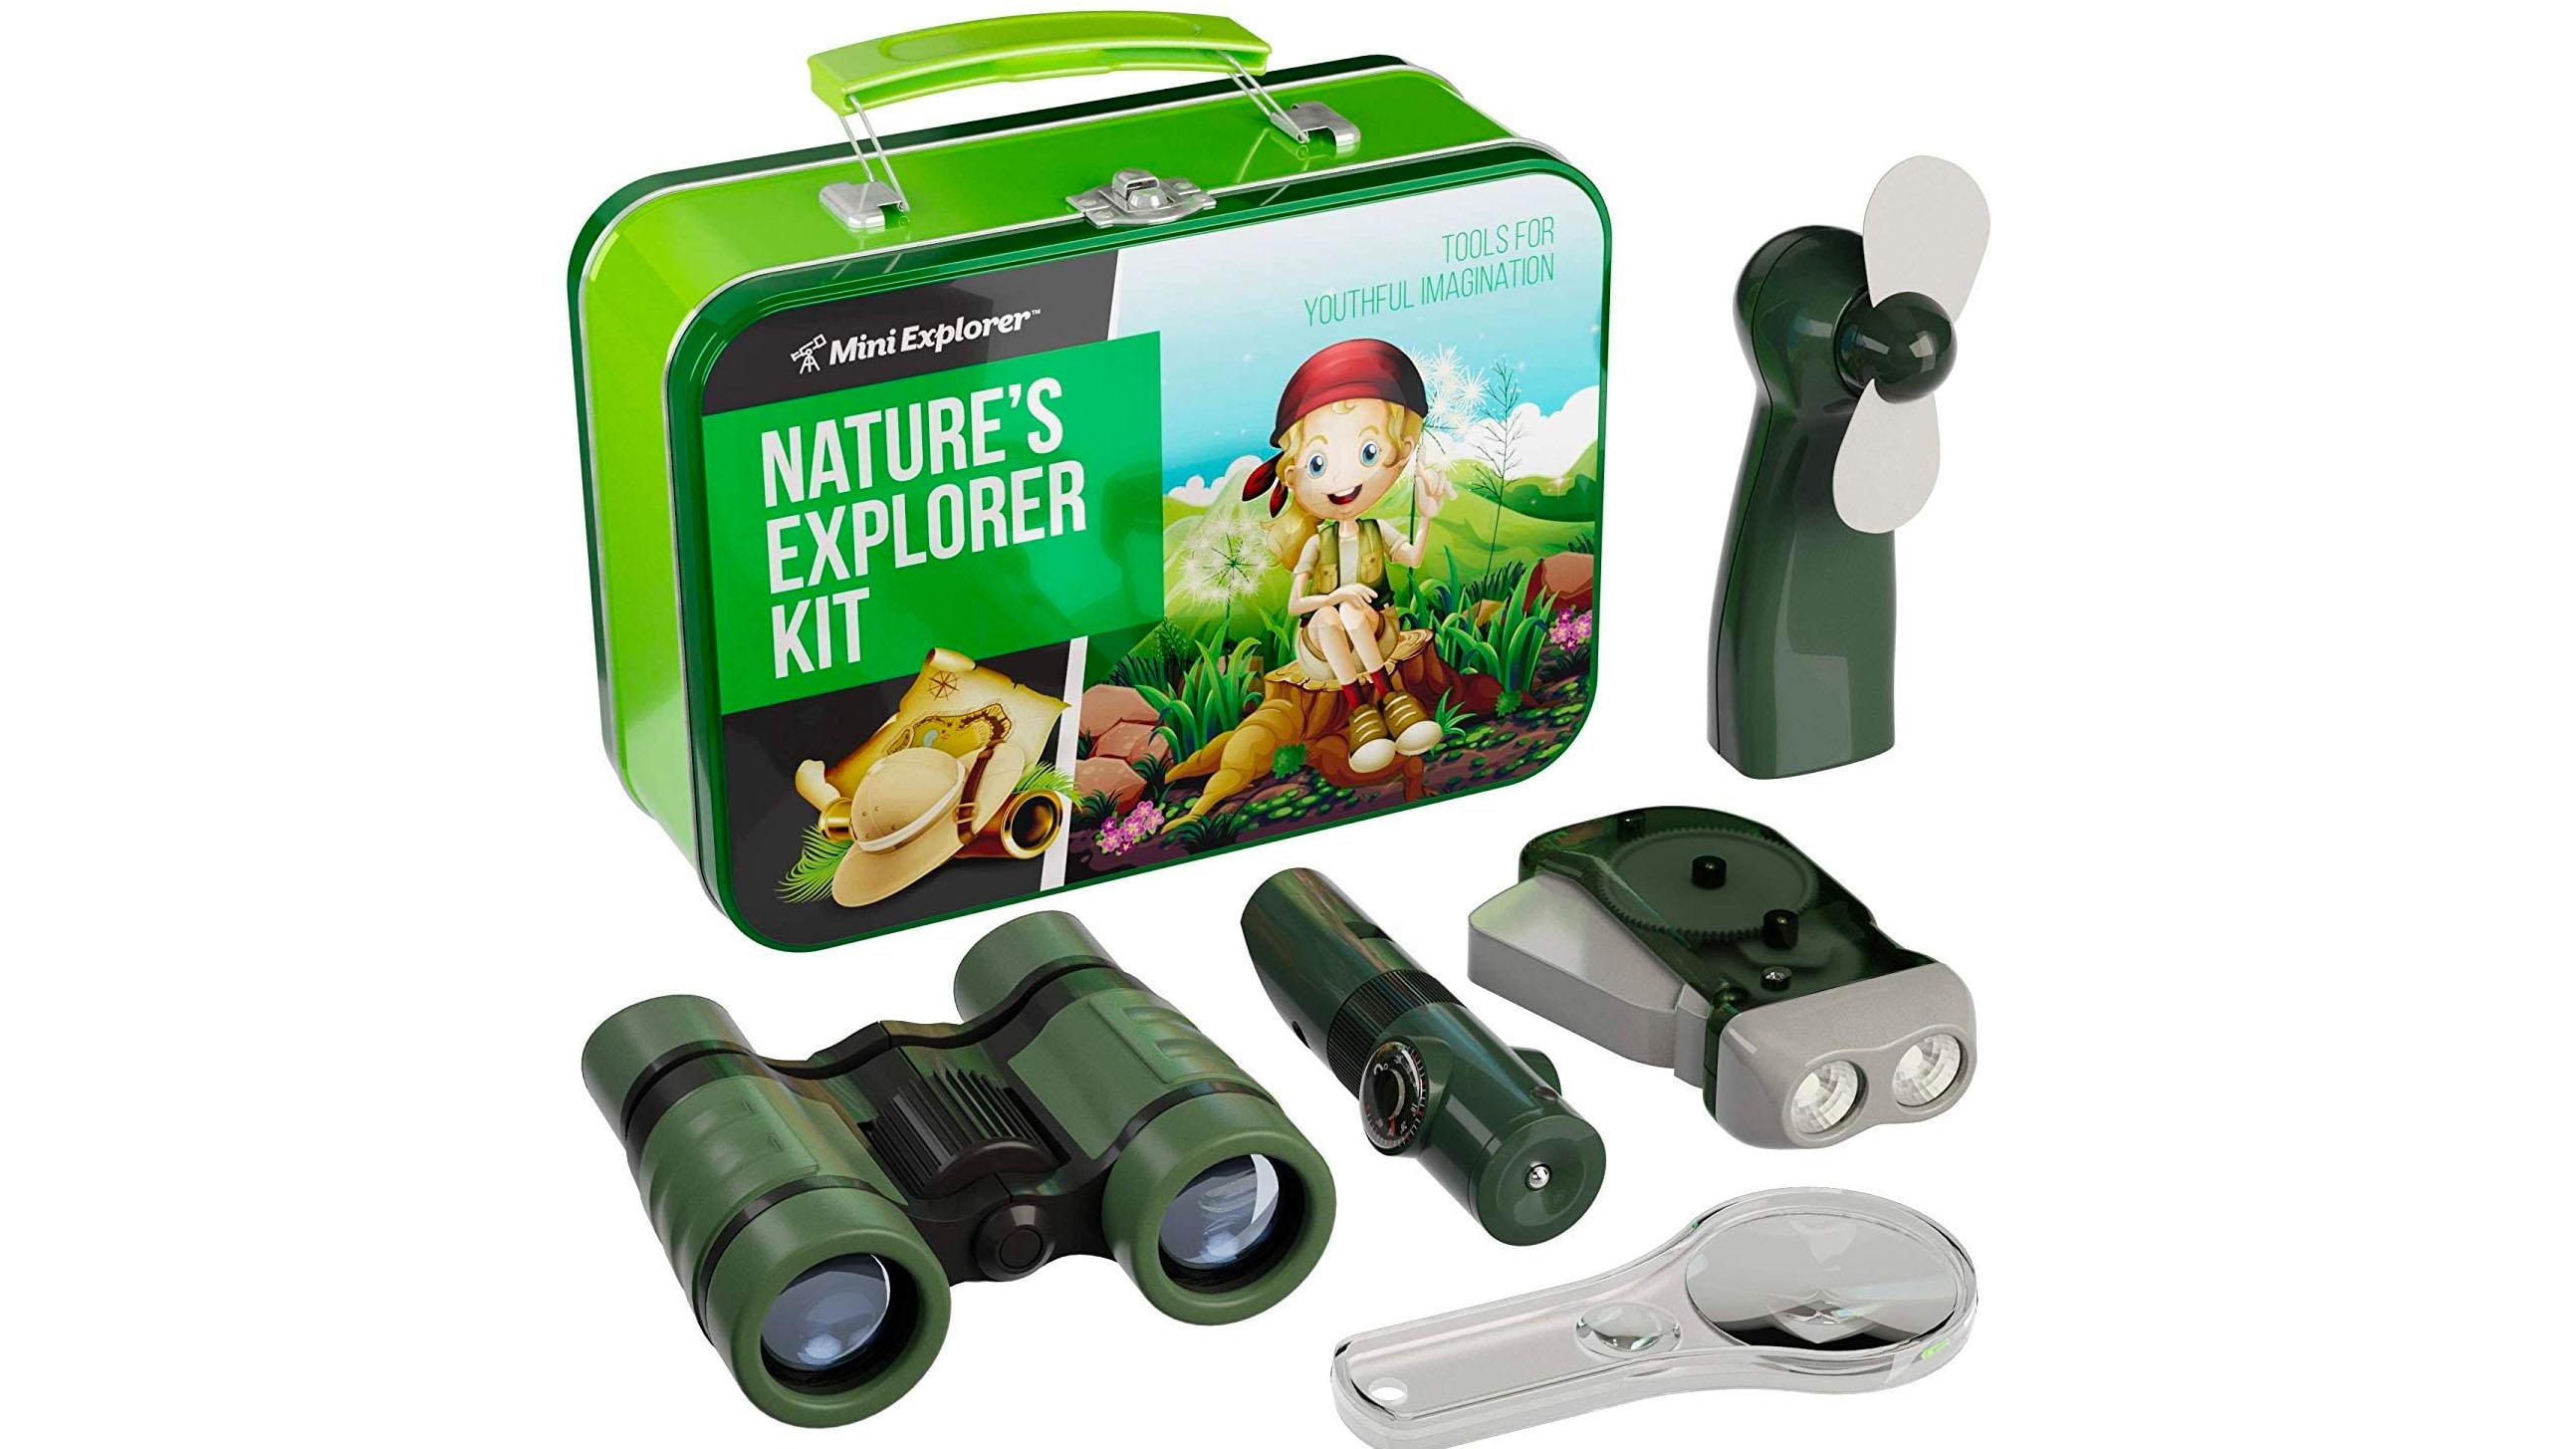 Mini Explorer binoculars for kids.